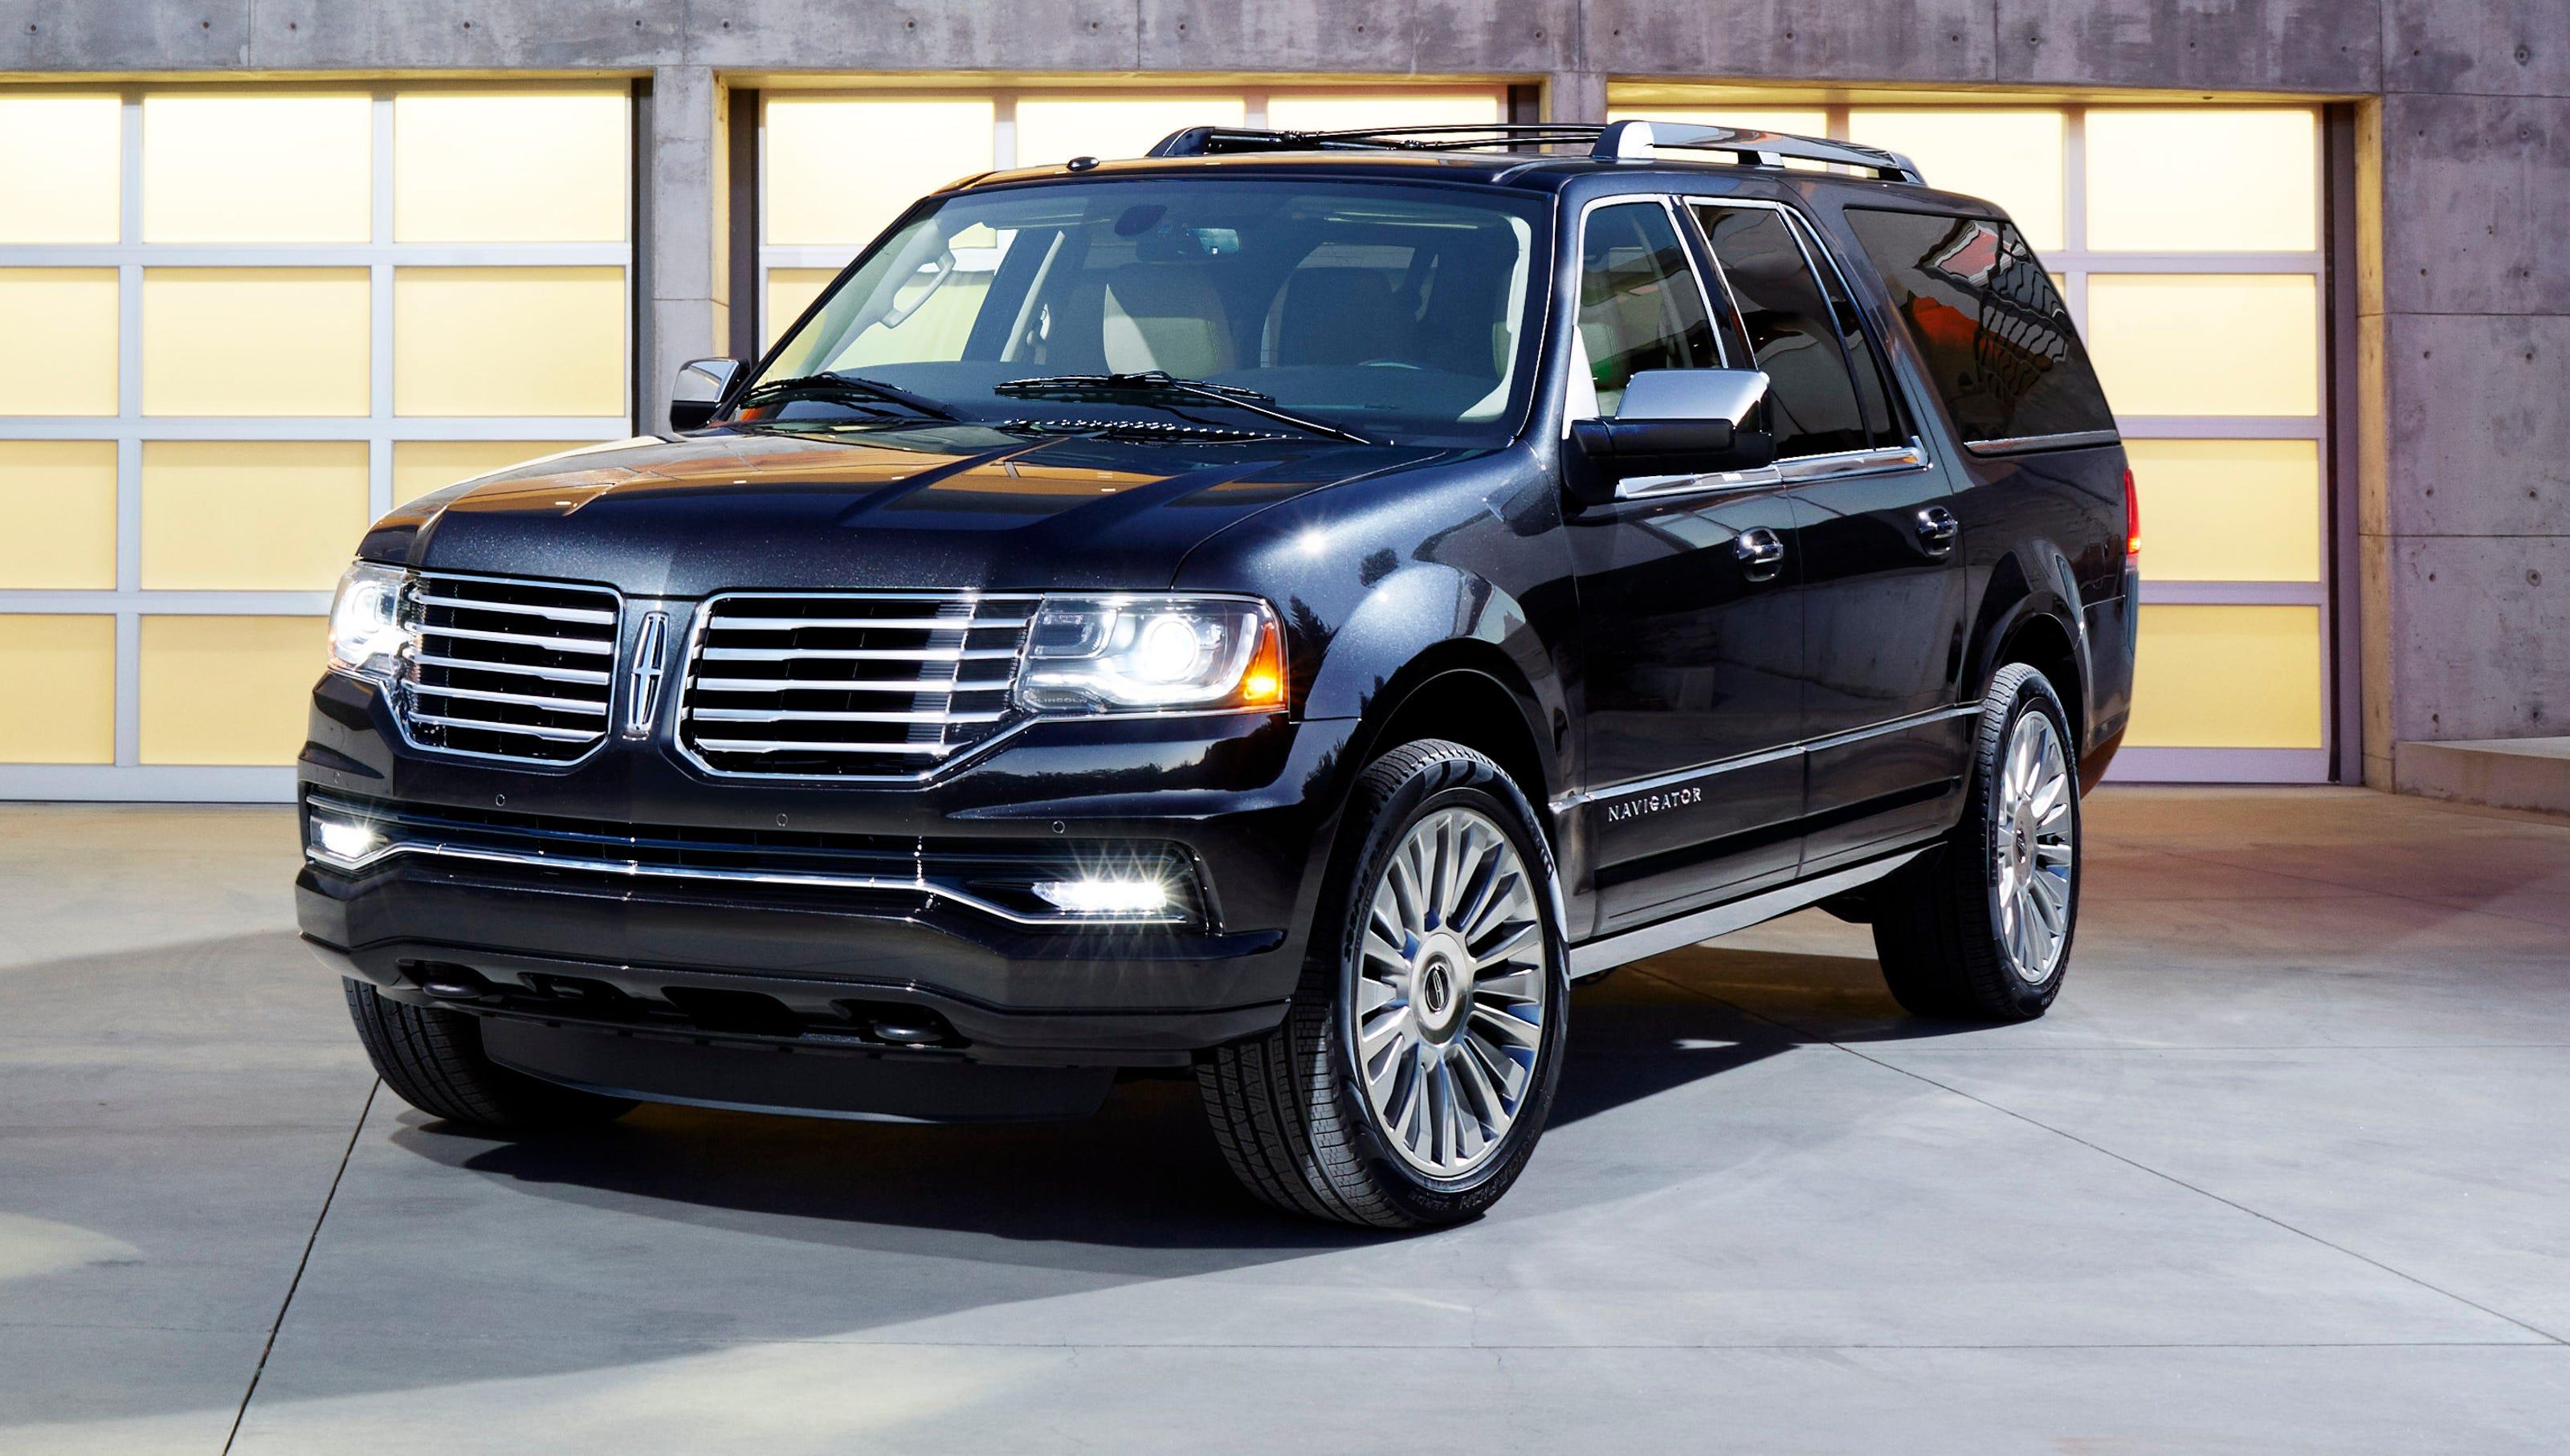 Lincoln Truck 2015 >> Big Suvs Return Lincoln Launches 2015 Navigator